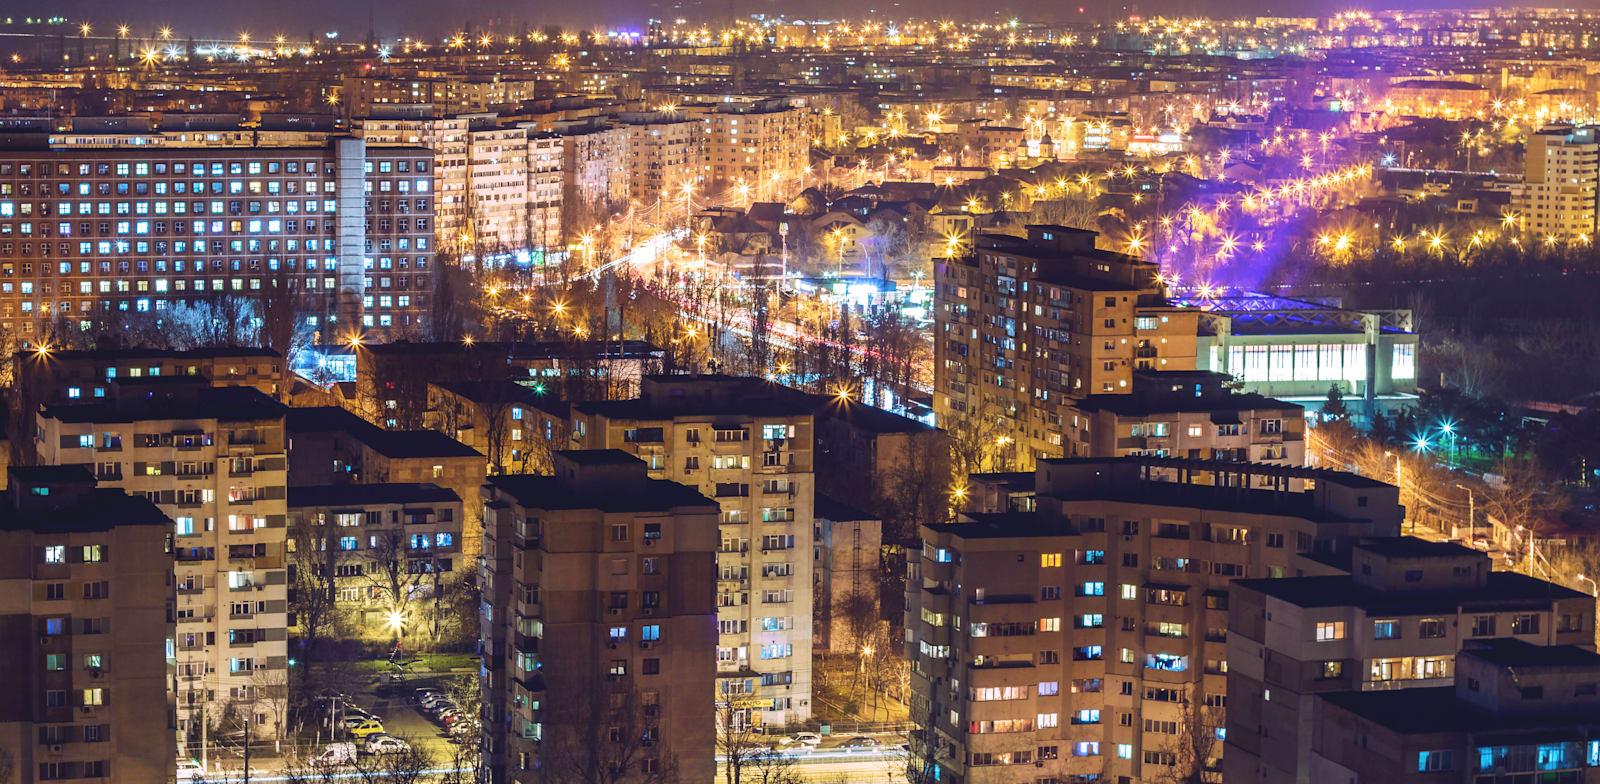 Romania Photo: Shutterstock